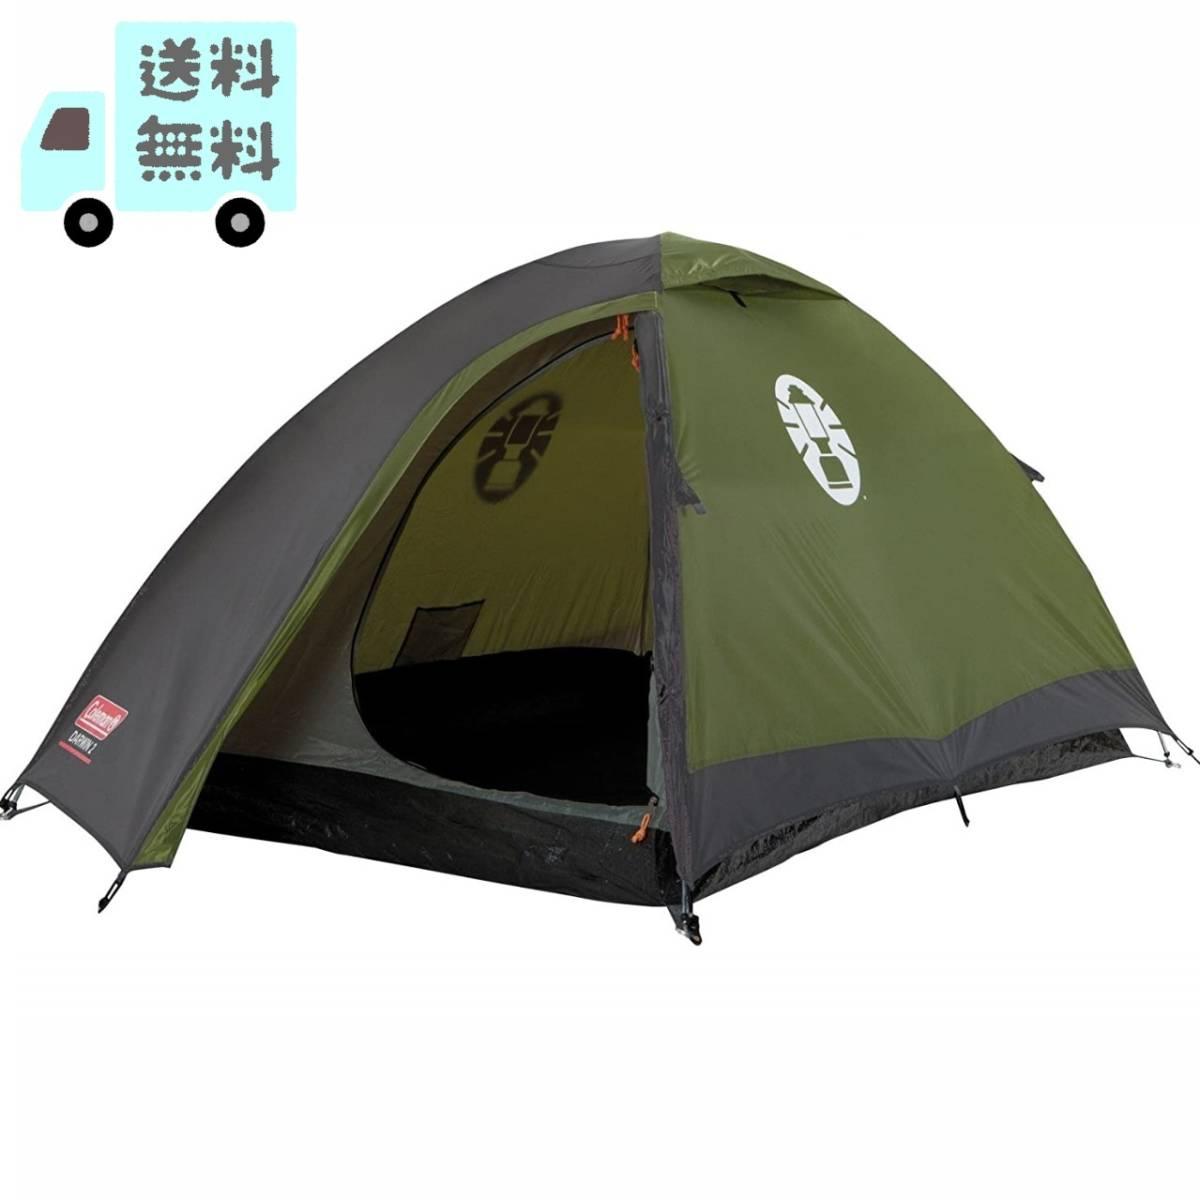 Coleman 2人用 テント 欧州限定モデル コールマン キャンプ ツーリング BBQ ソロ キャン